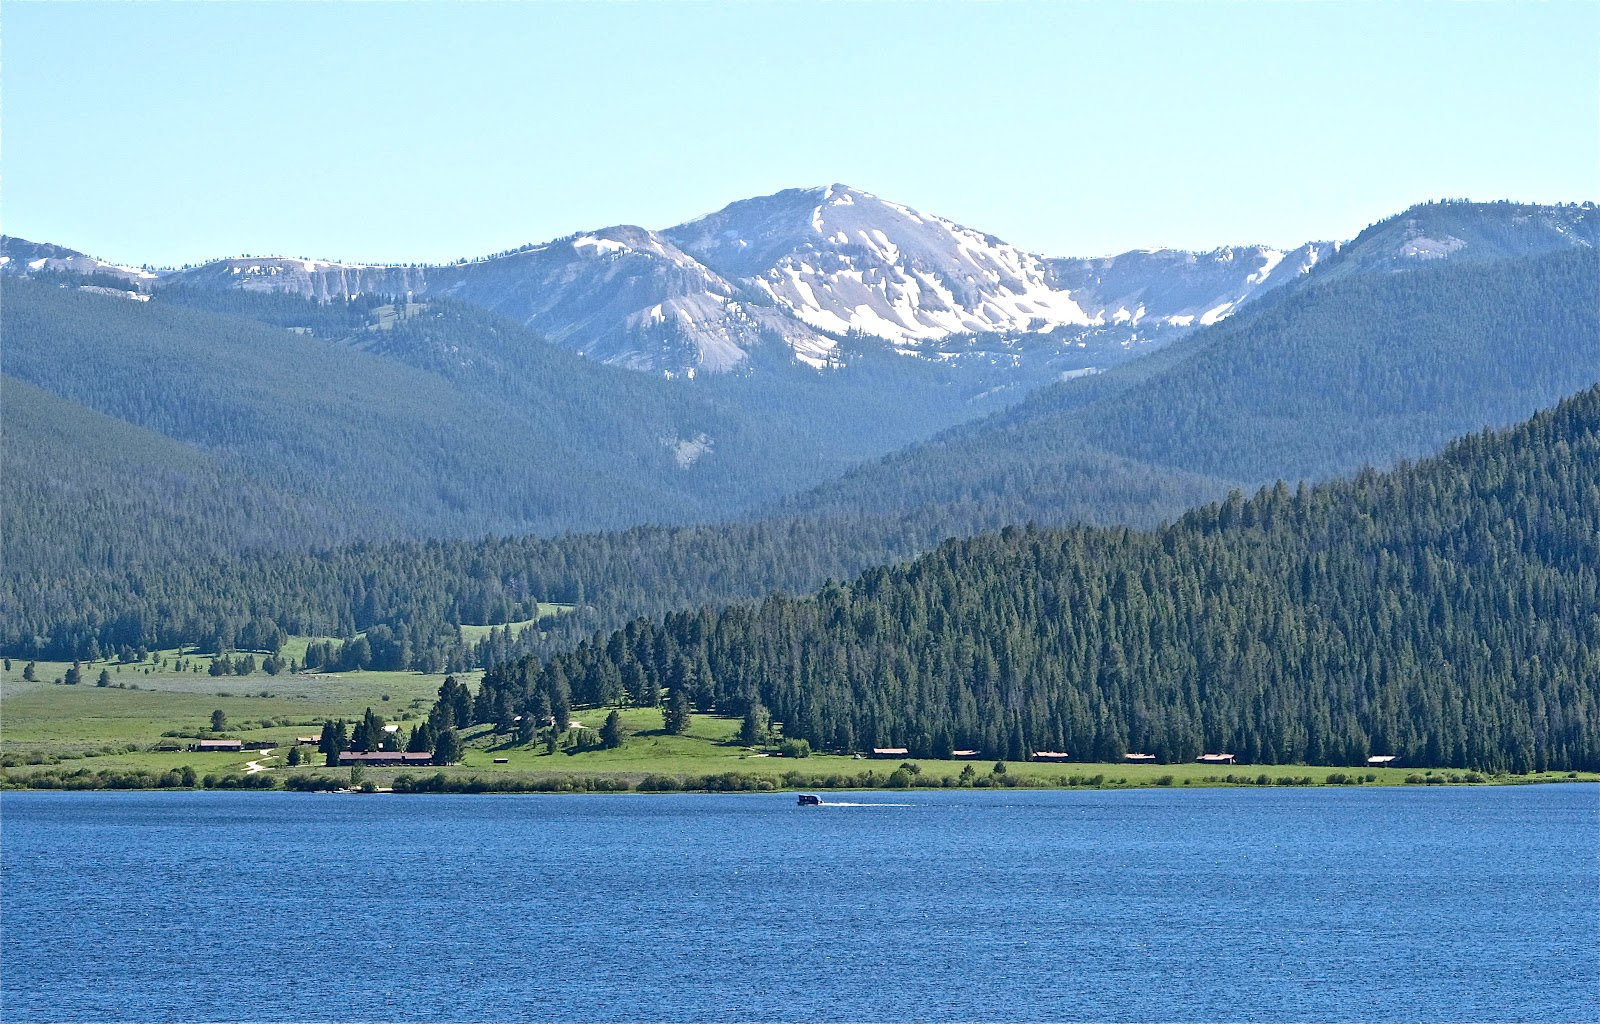 Quot Calgary Stampede Trip Quot Quot Hebgen Dam Amp Lake Quot